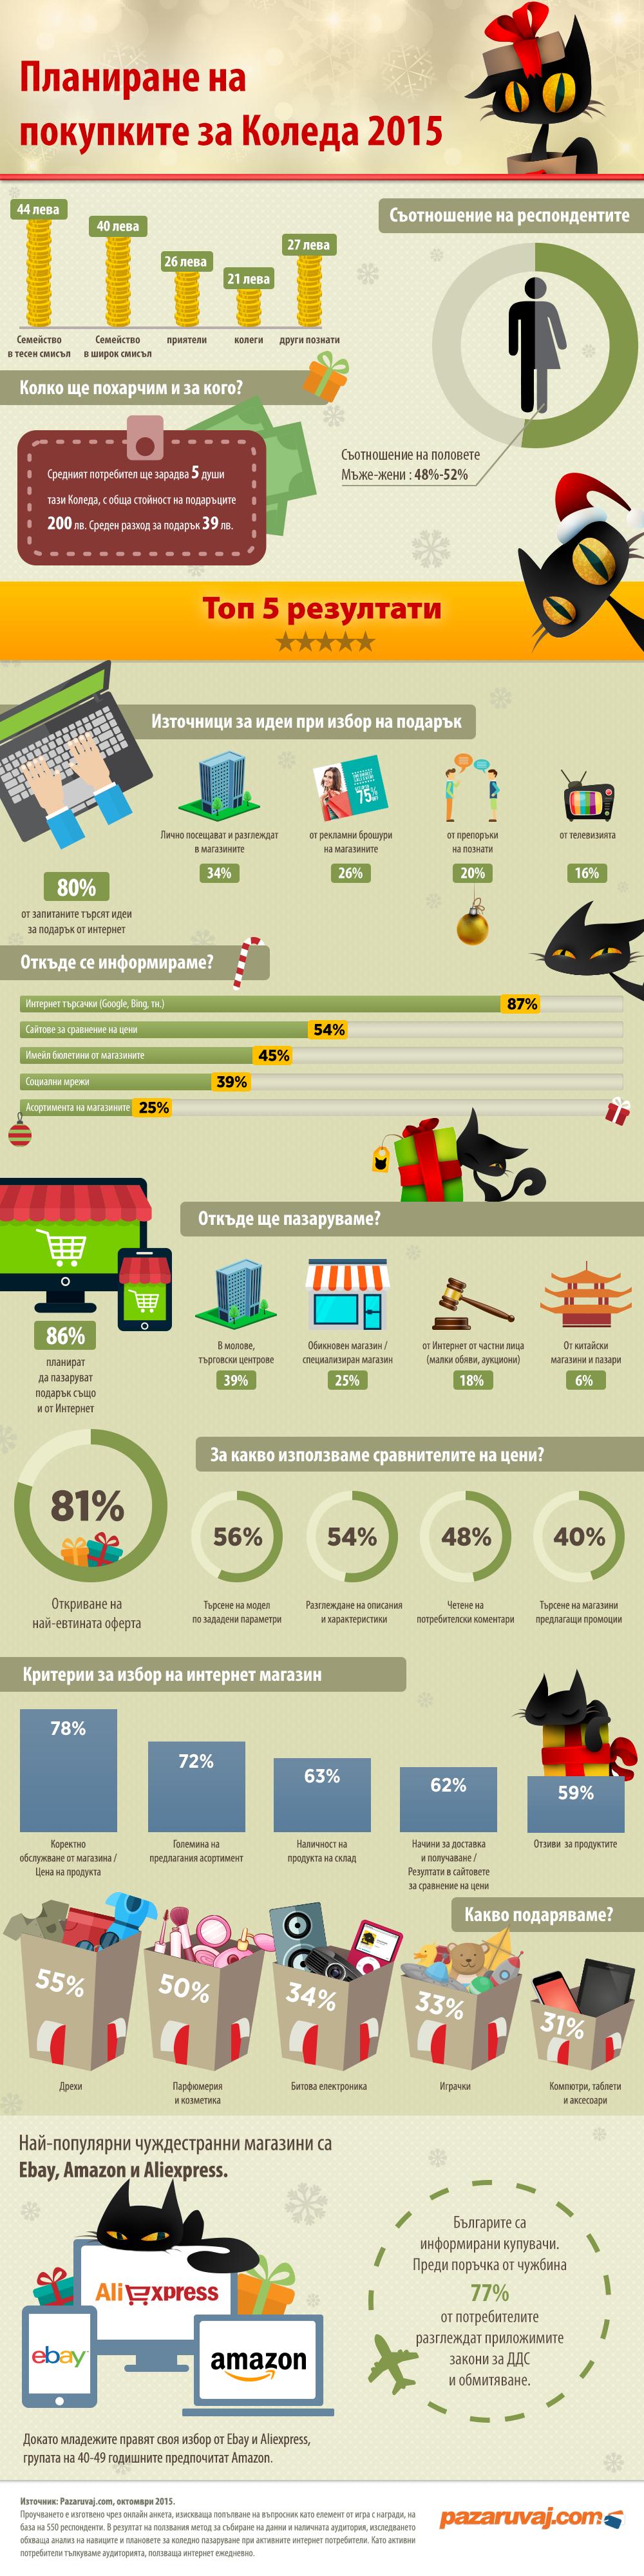 Инфографика Pazaruvaj.com